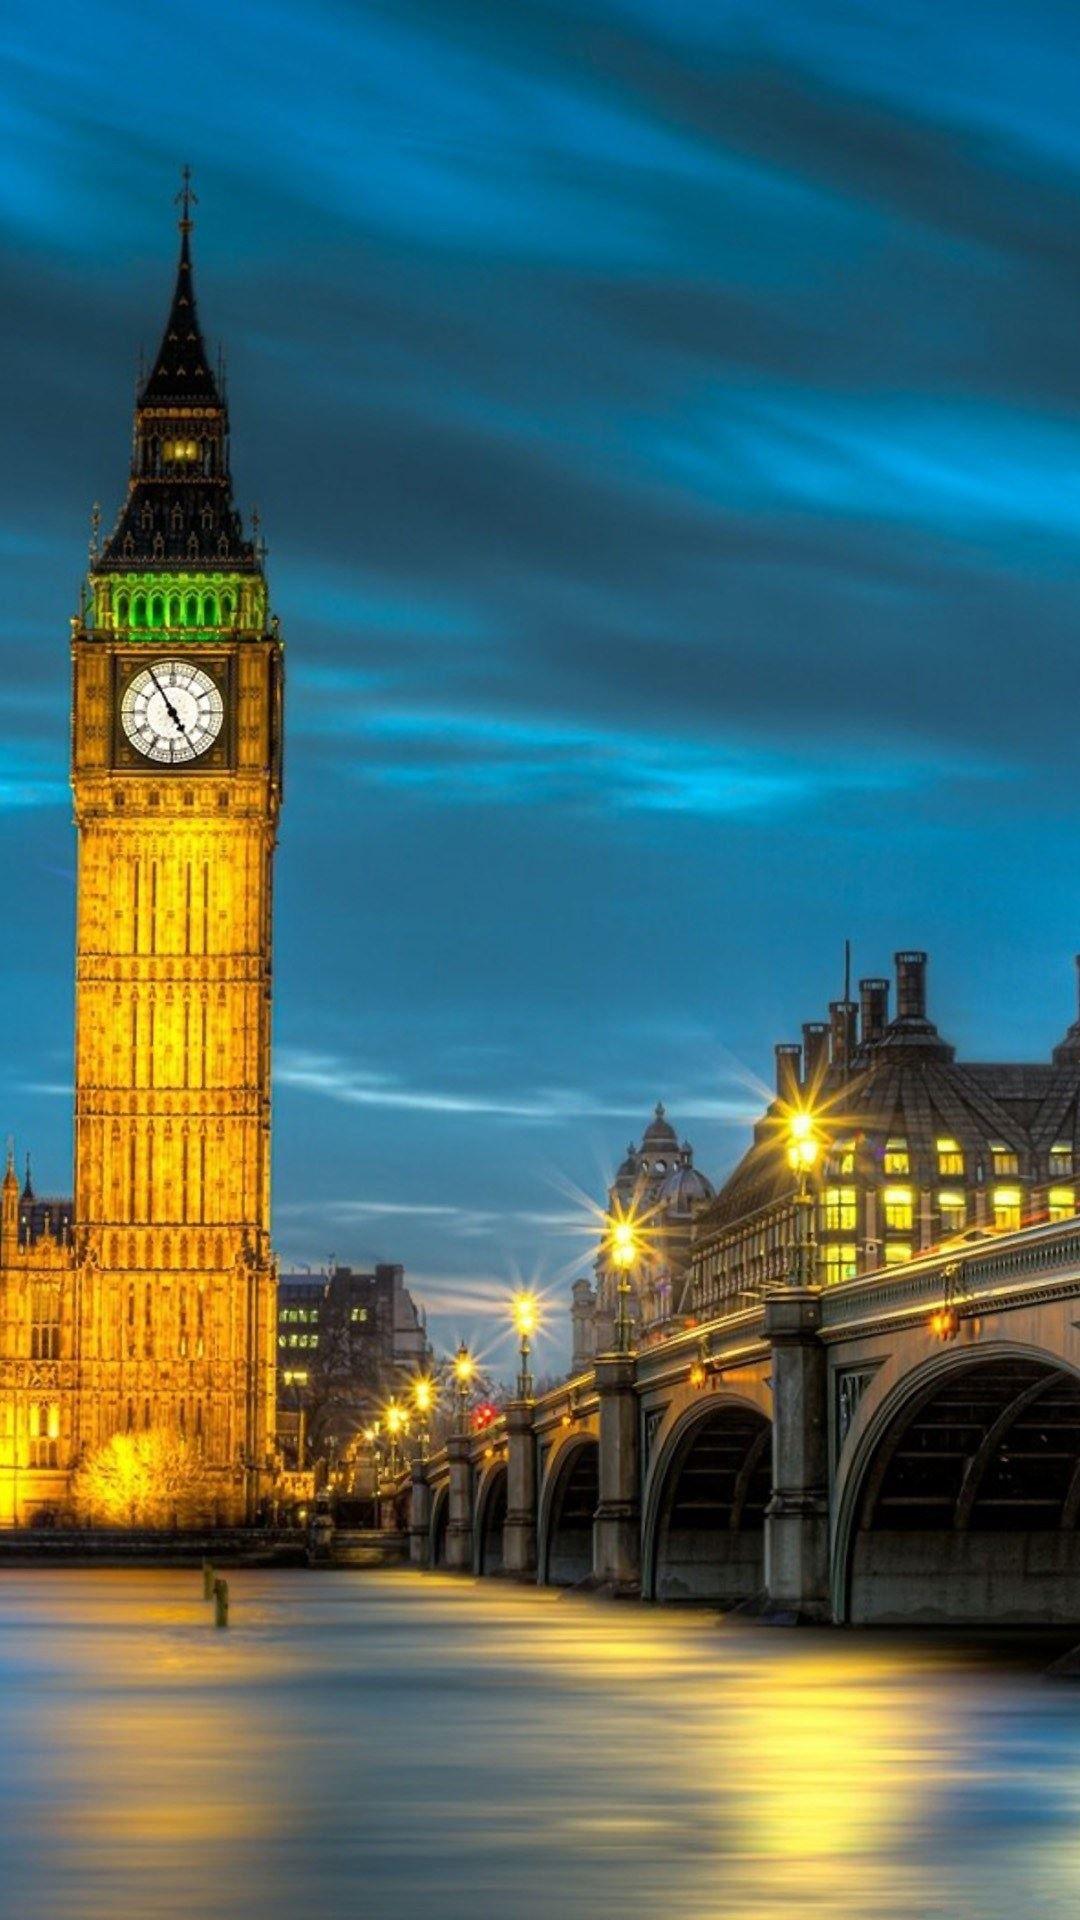 London Big Ben Illustration HTC One wallpaper